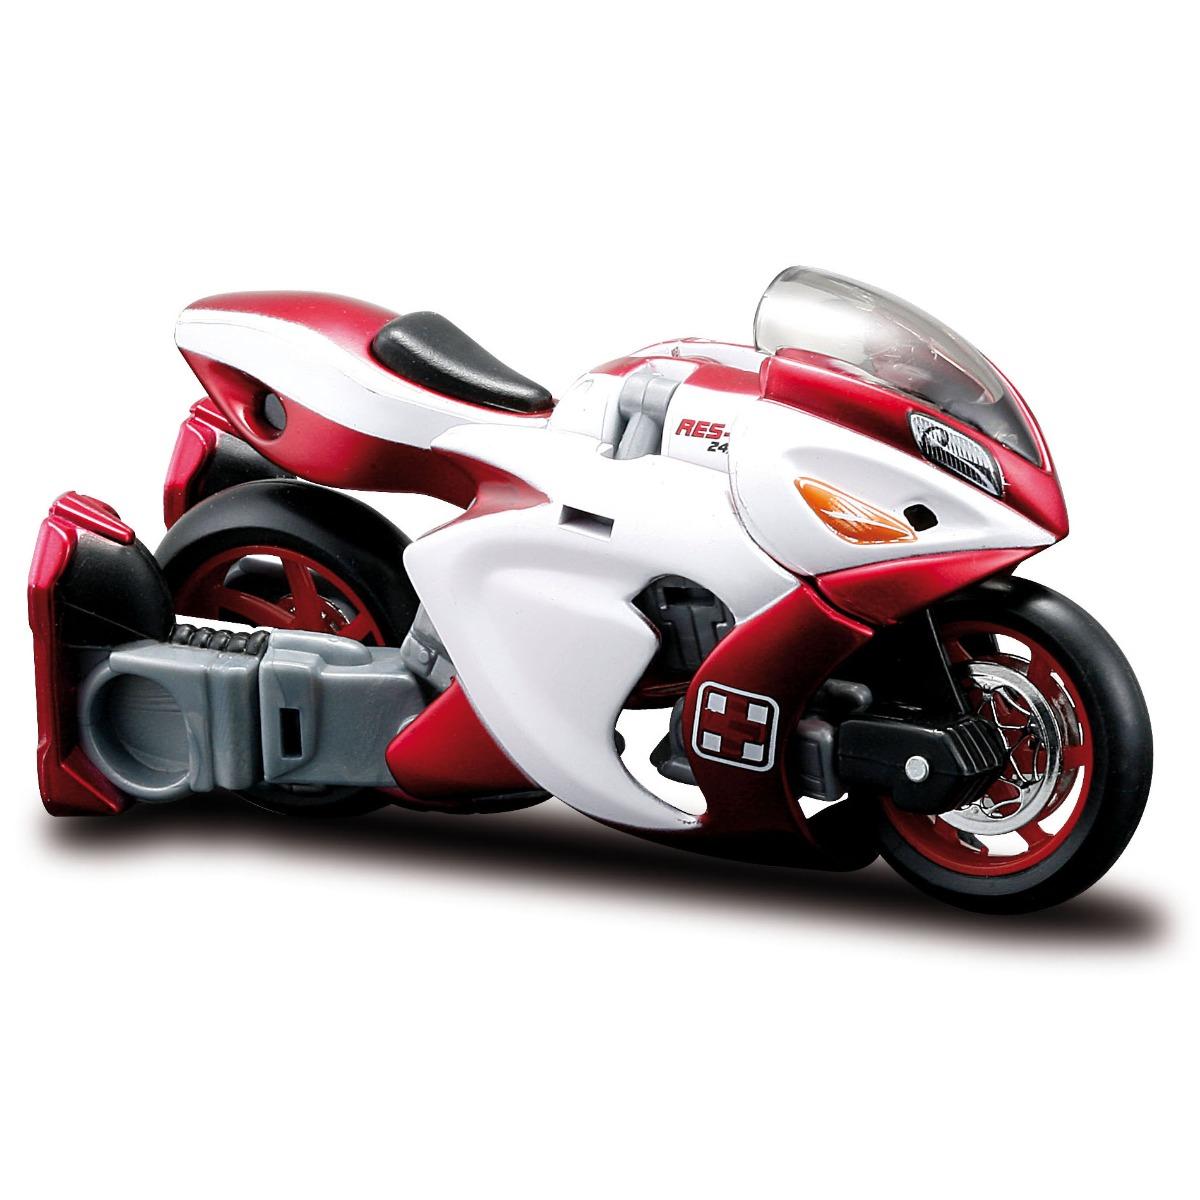 Motocicleta transformabila Maisto Cykons, 1:18, Res-q